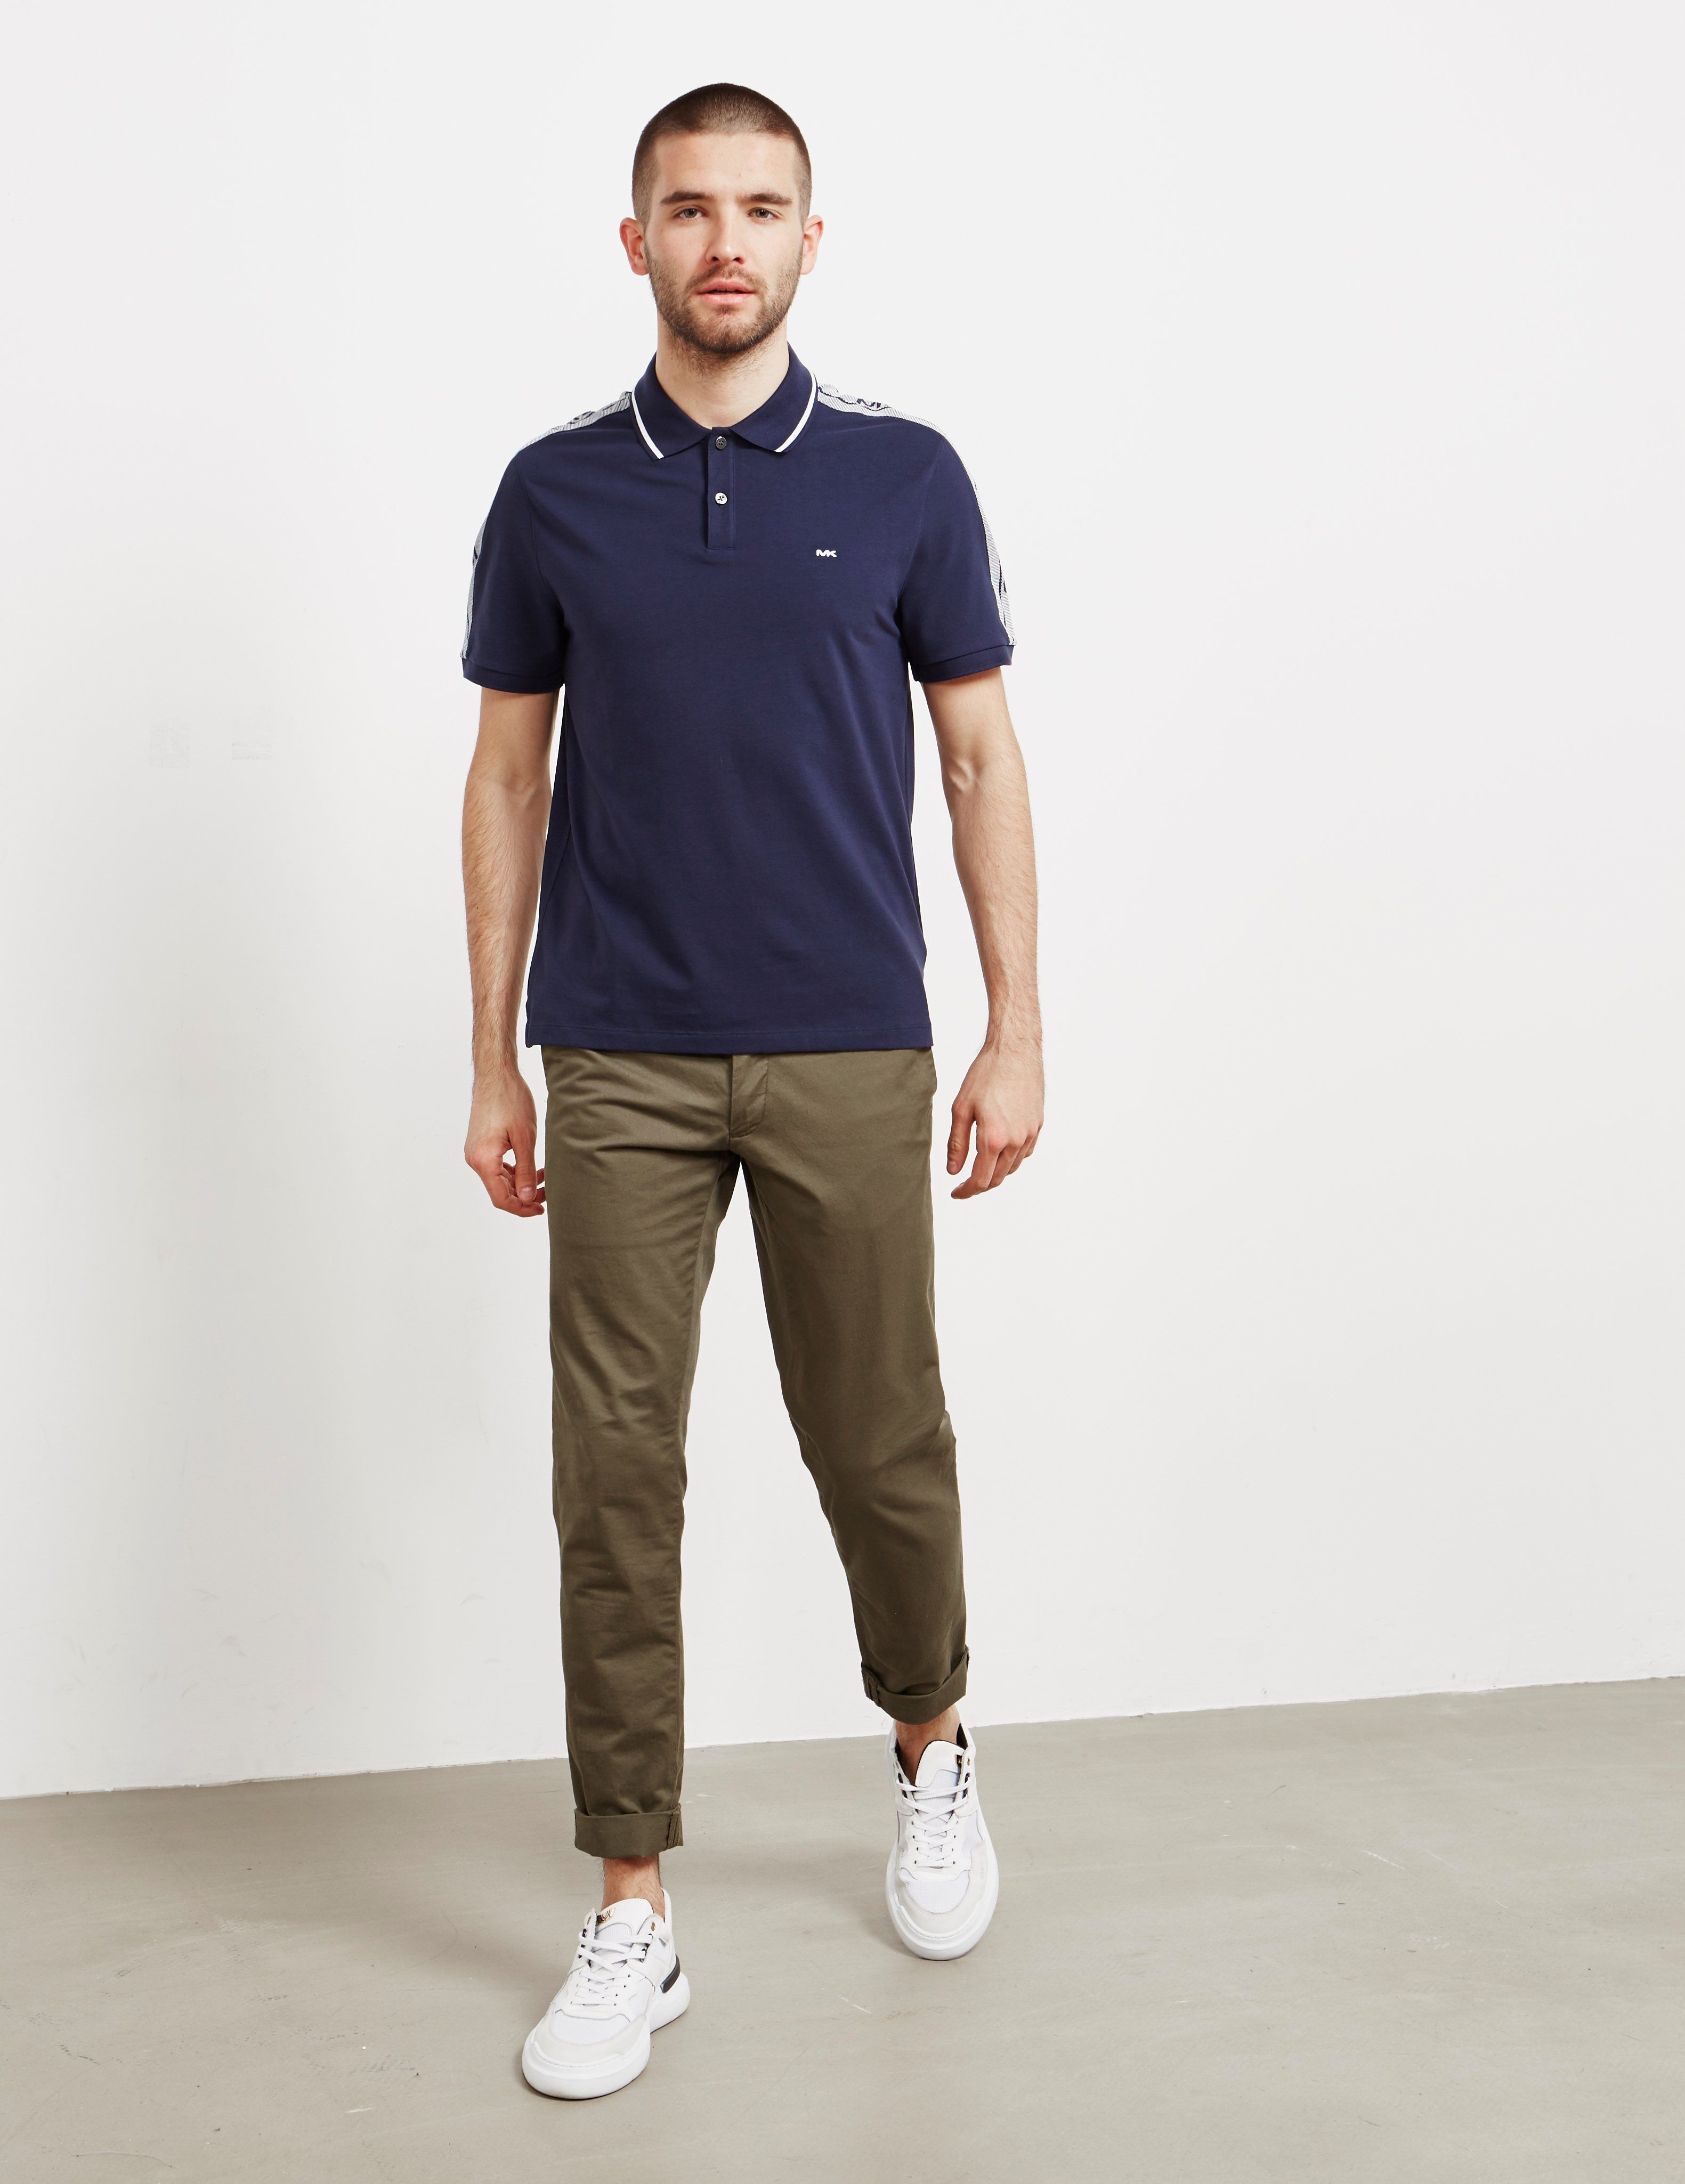 Michael Kors Tape Shoulder Short Sleeve Polo Shirt